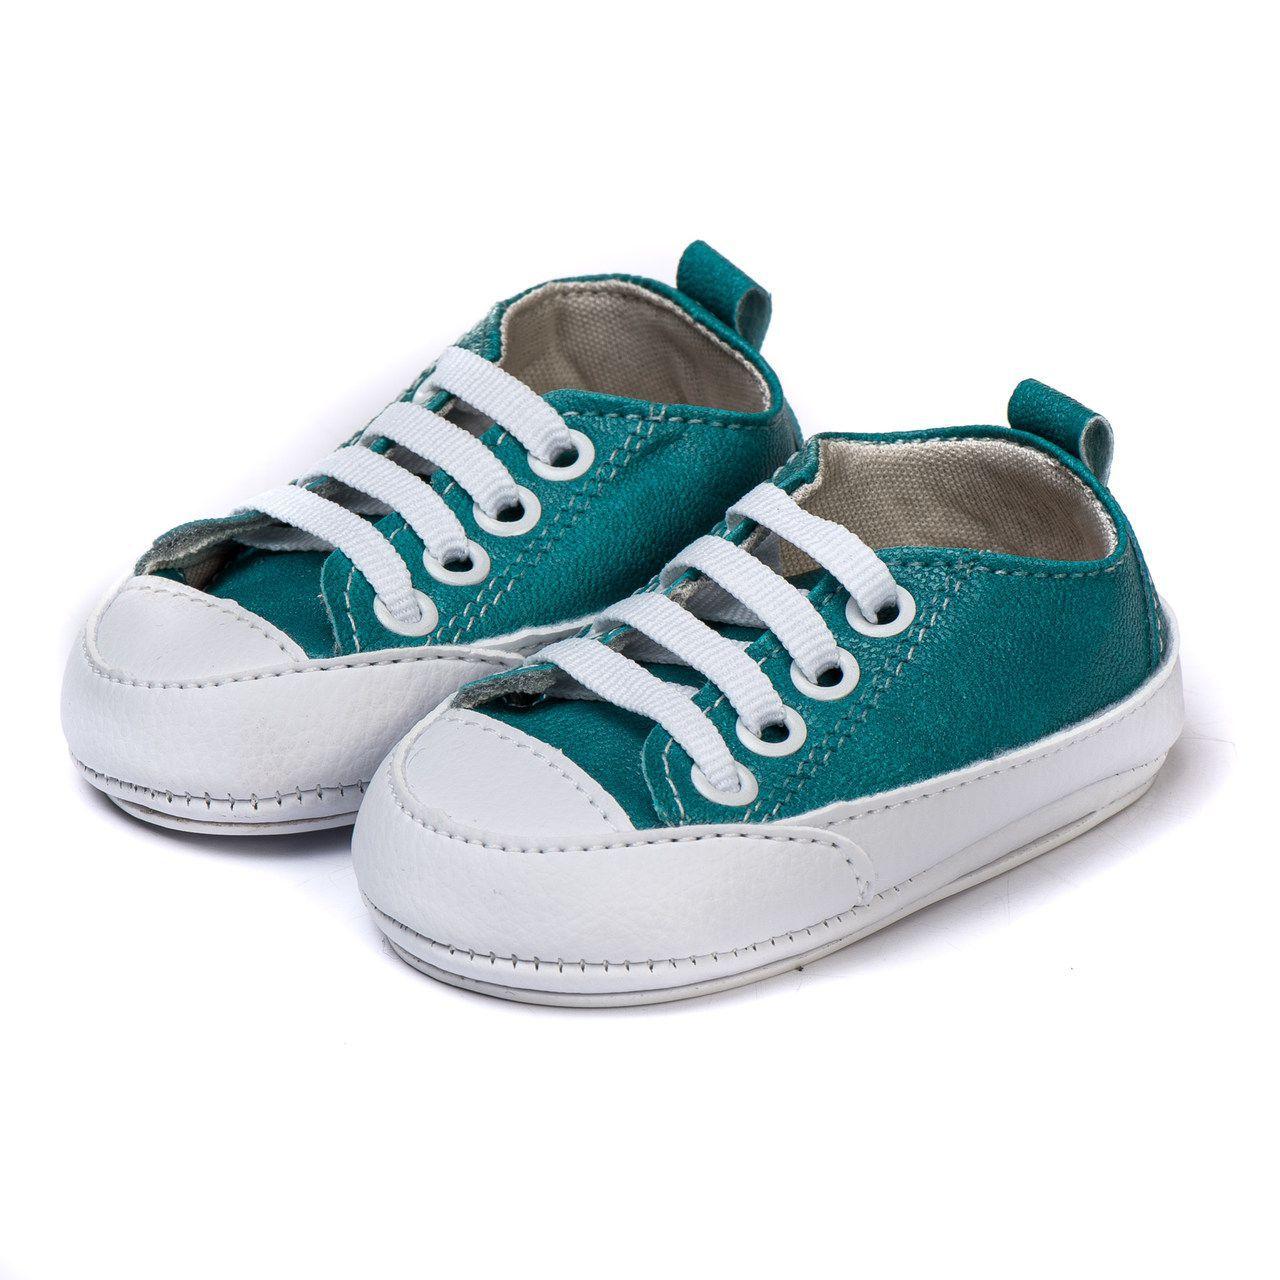 Tênis Bebe Infantil Kapell Verde e  Branco